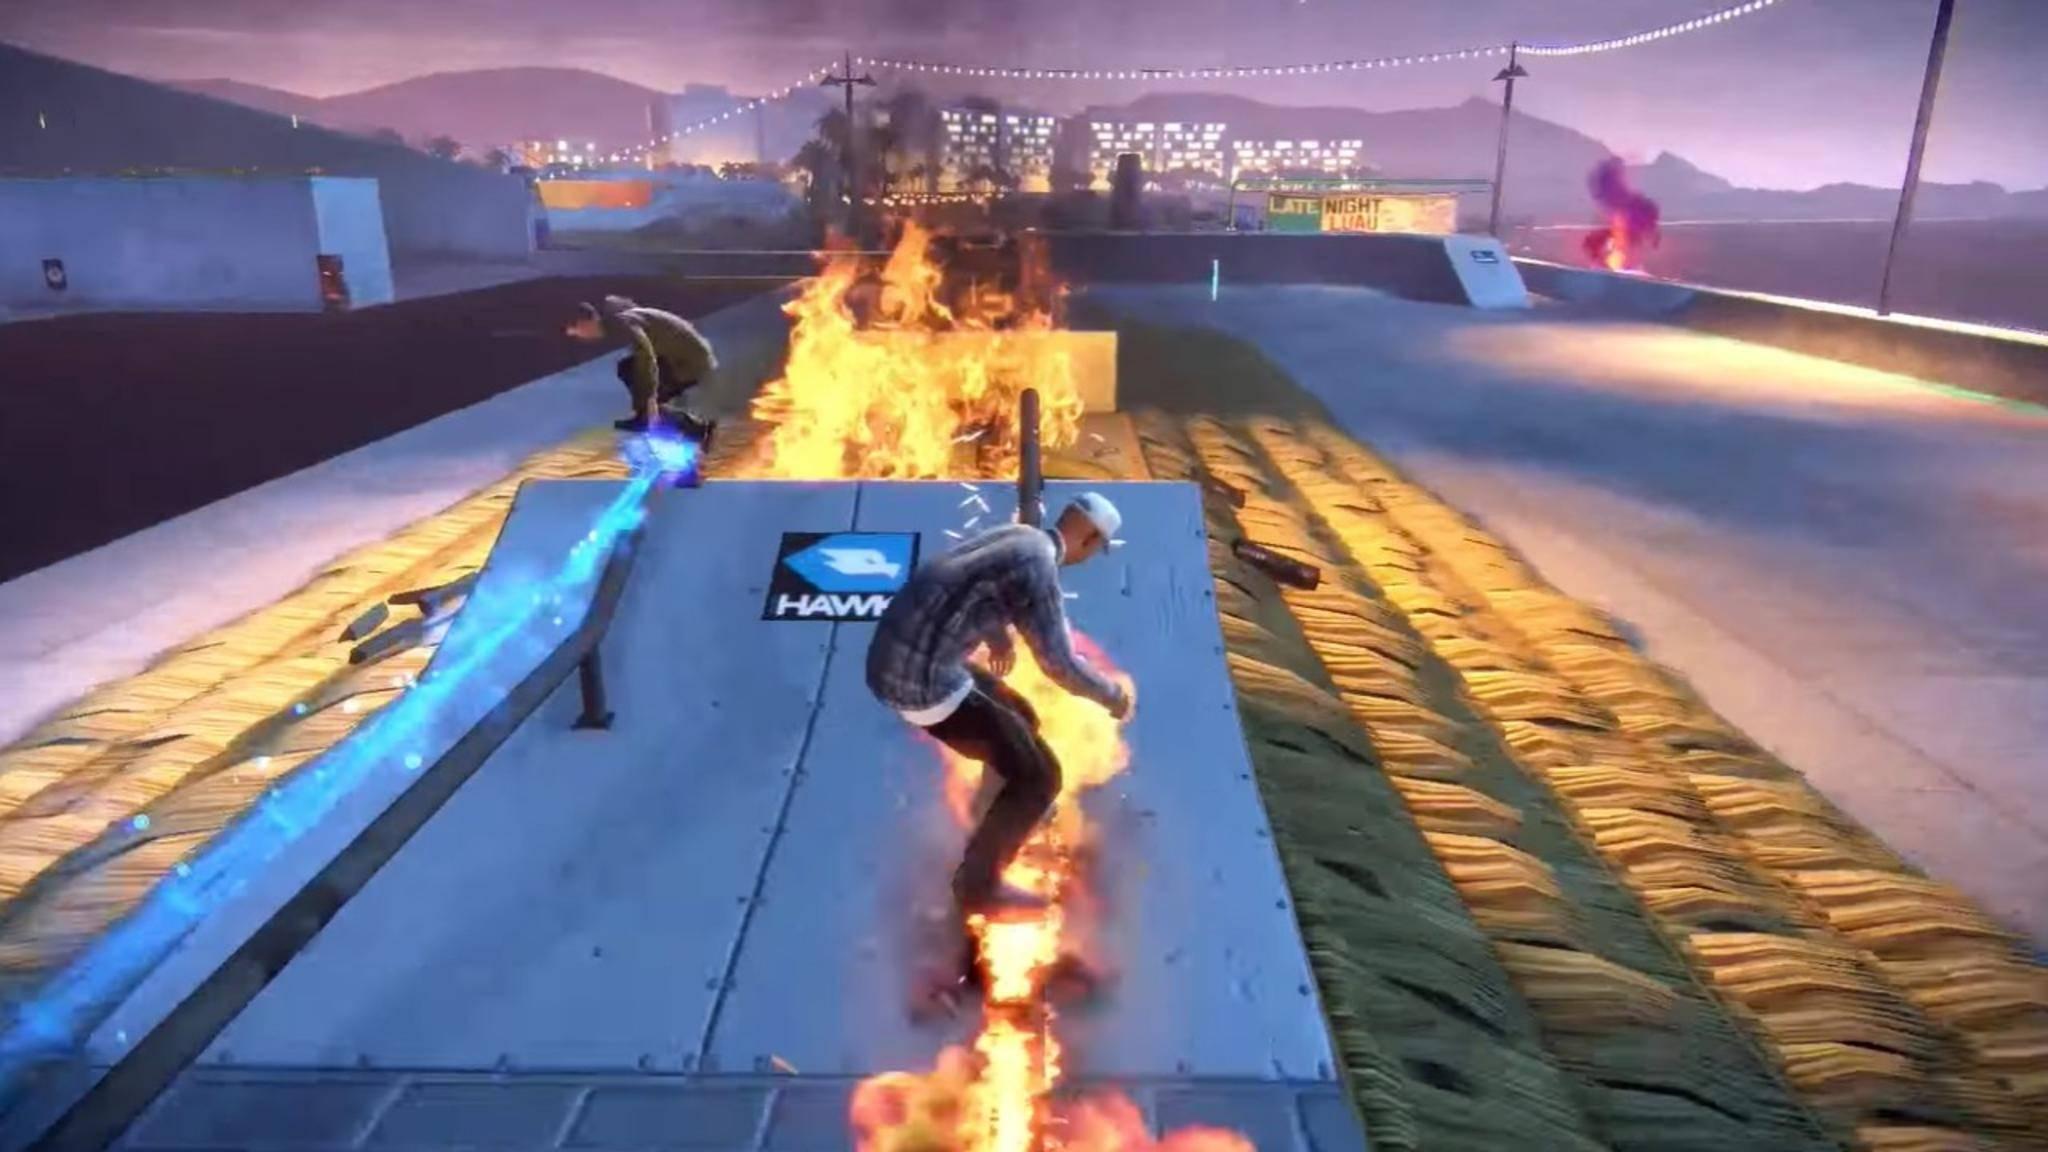 tony-hawks-pro-skater-5-trailer-screenshot